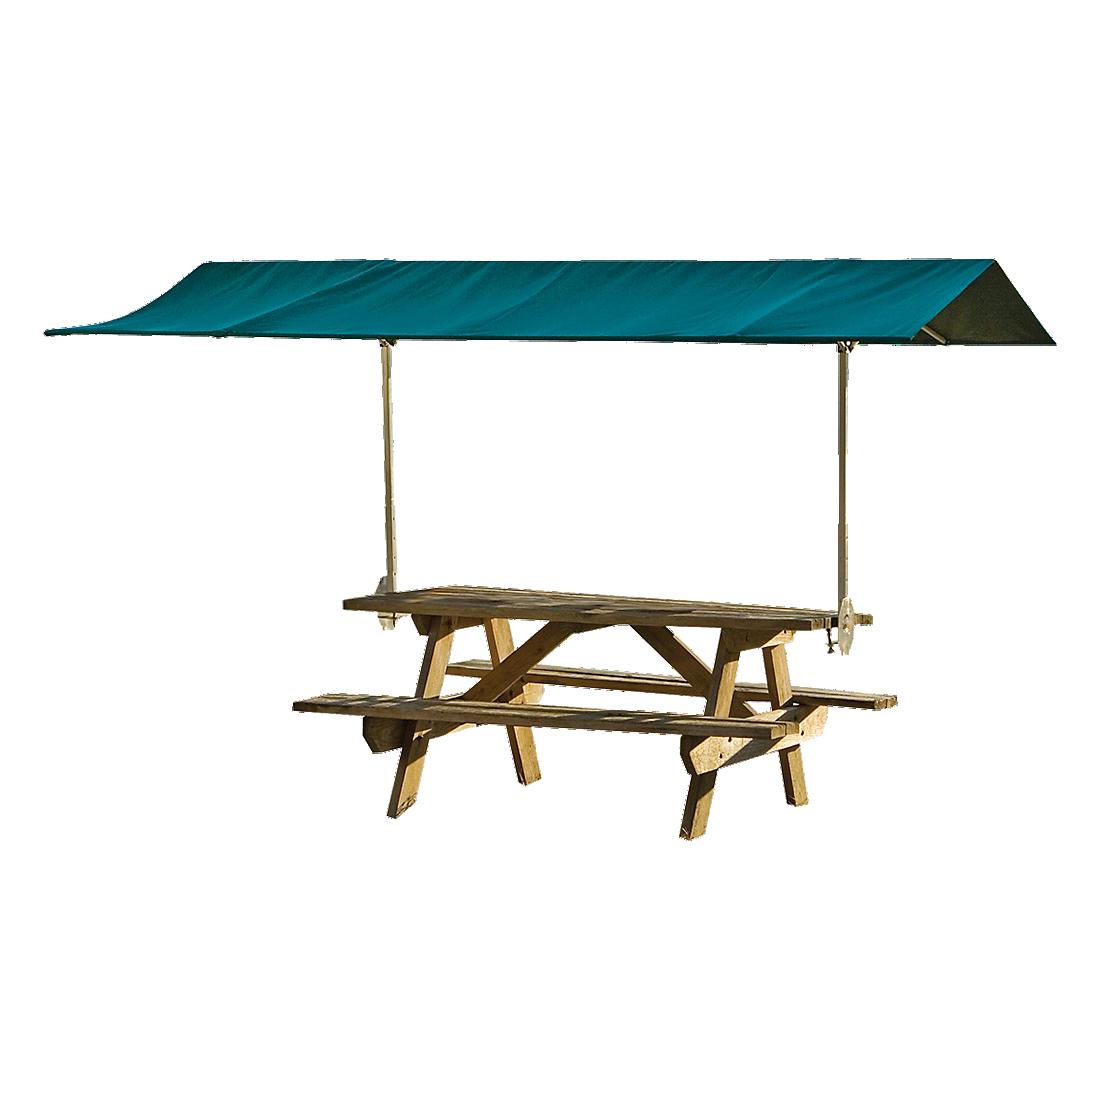 clamp canopy™